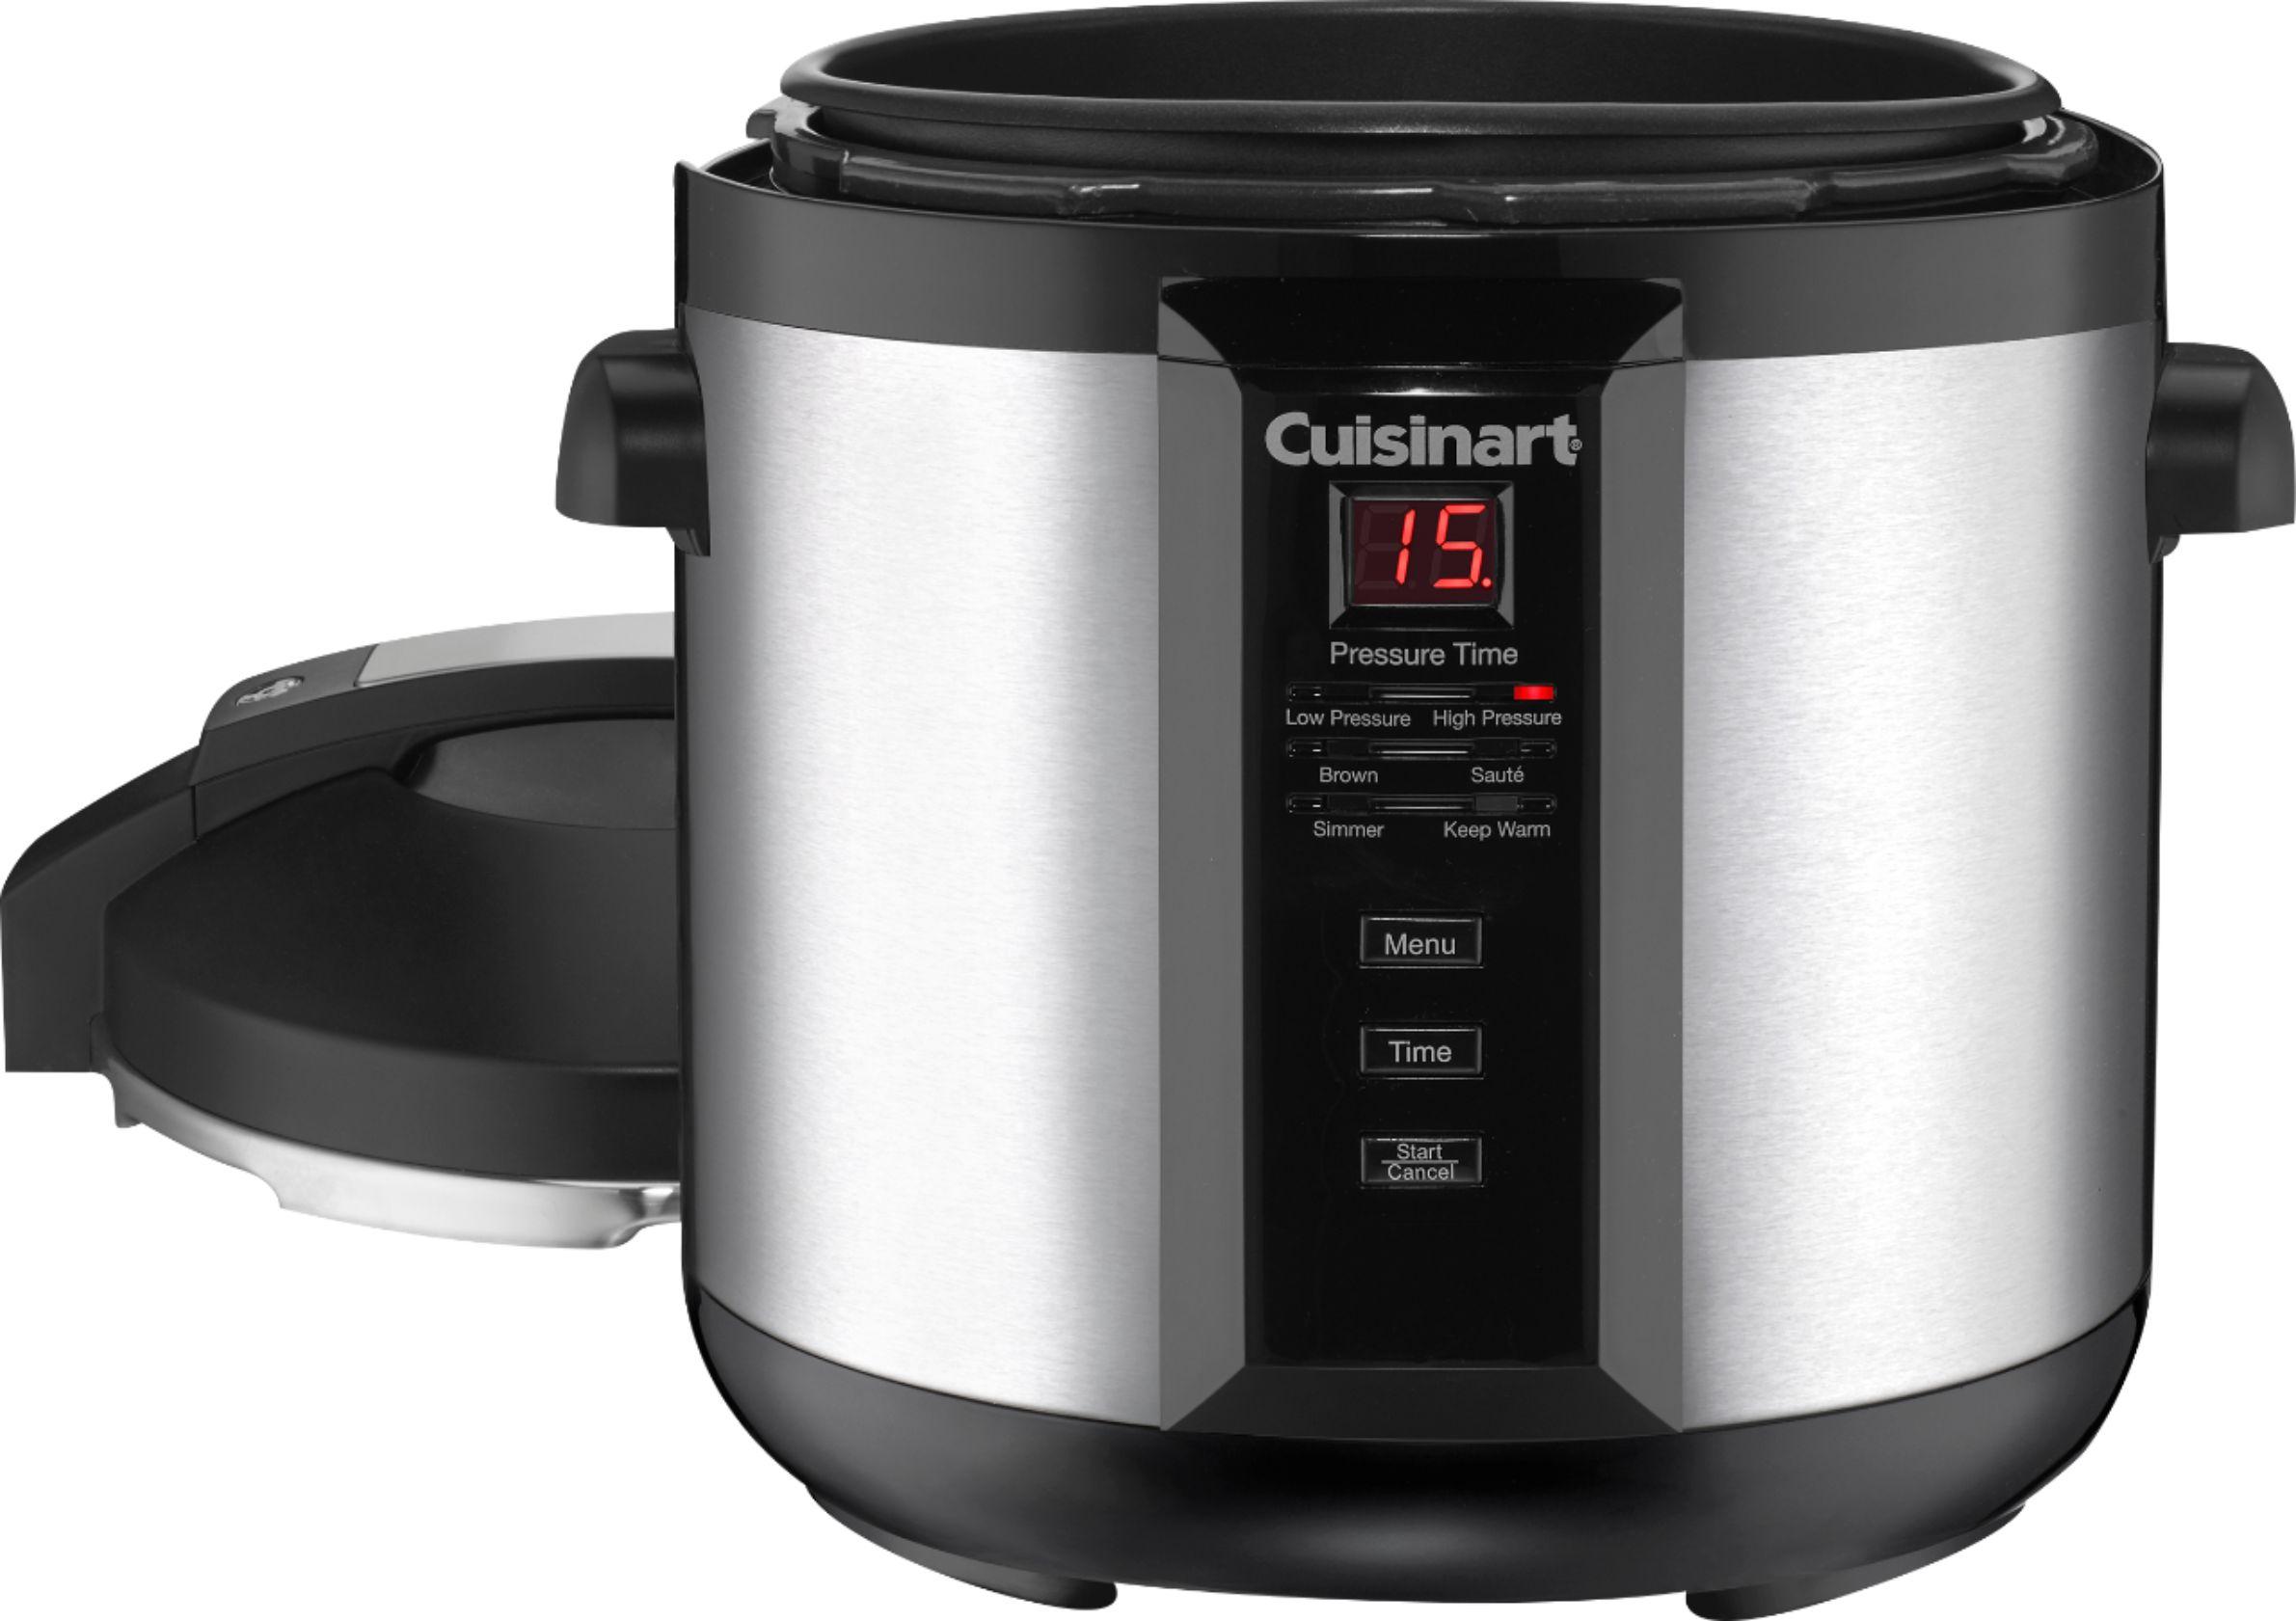 cuisinart 6qt digital pressure cooker brushed stainless steel